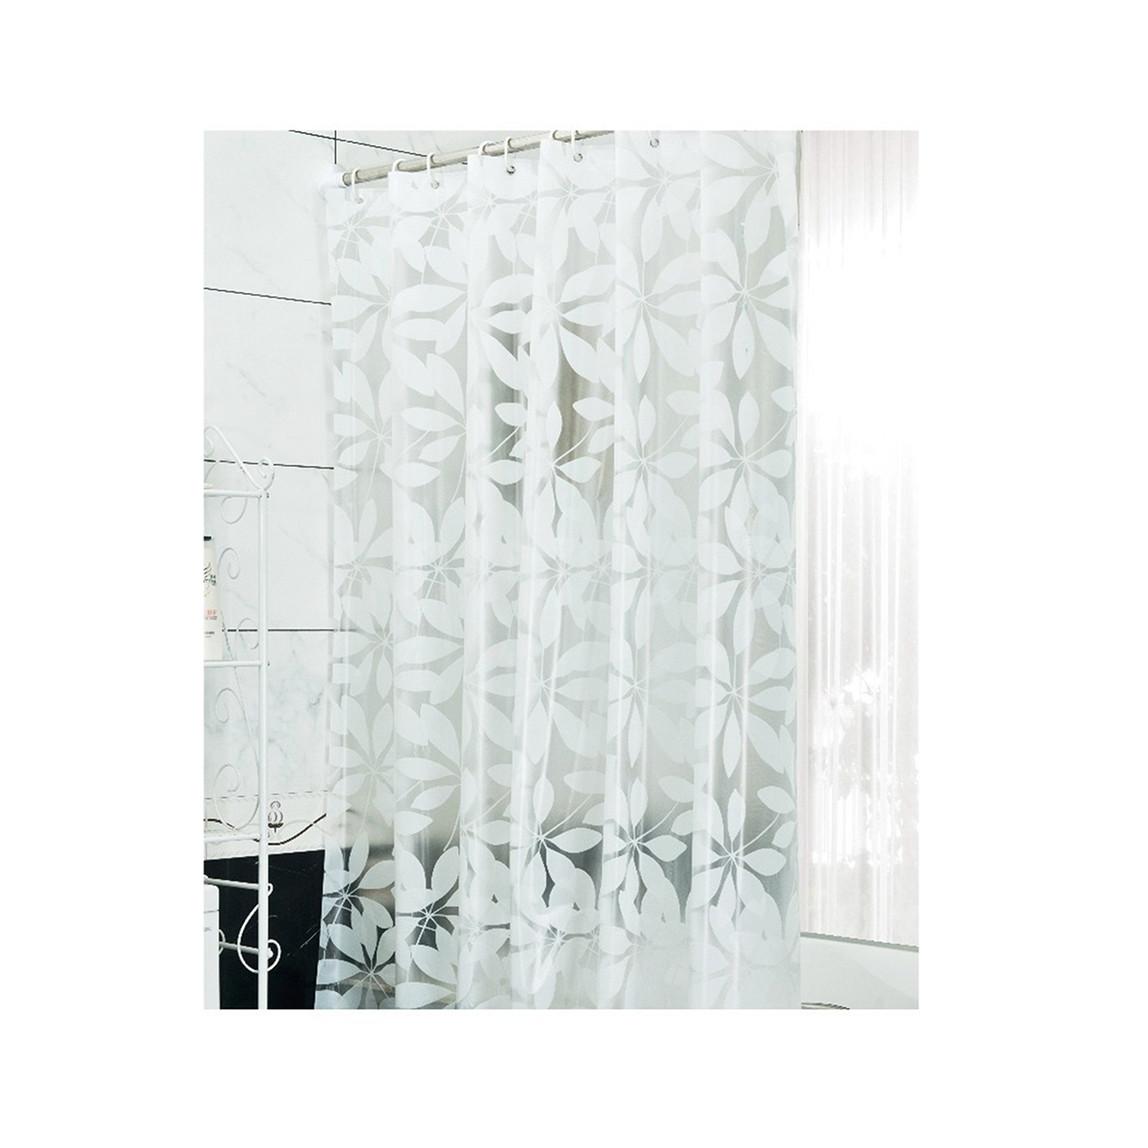 Lotus Banyo Perdesi Pvc 180x200 cm